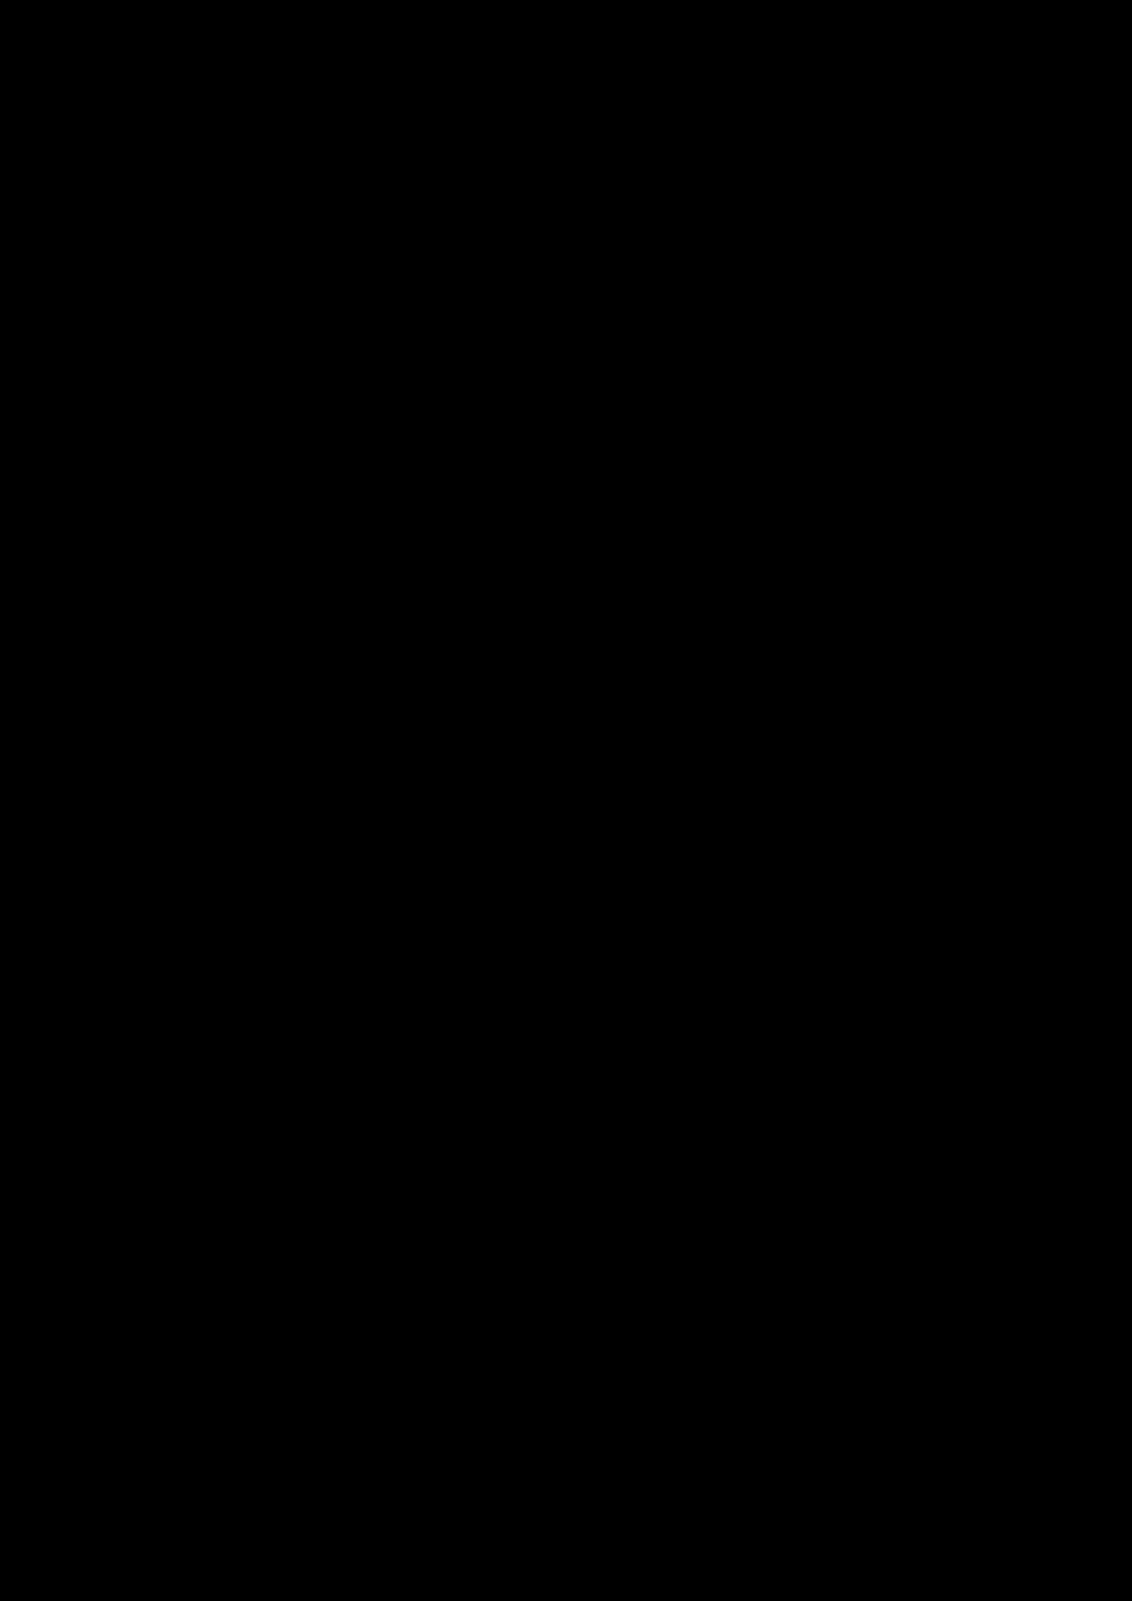 Ispoved Pervogo Boga slide, Image 25